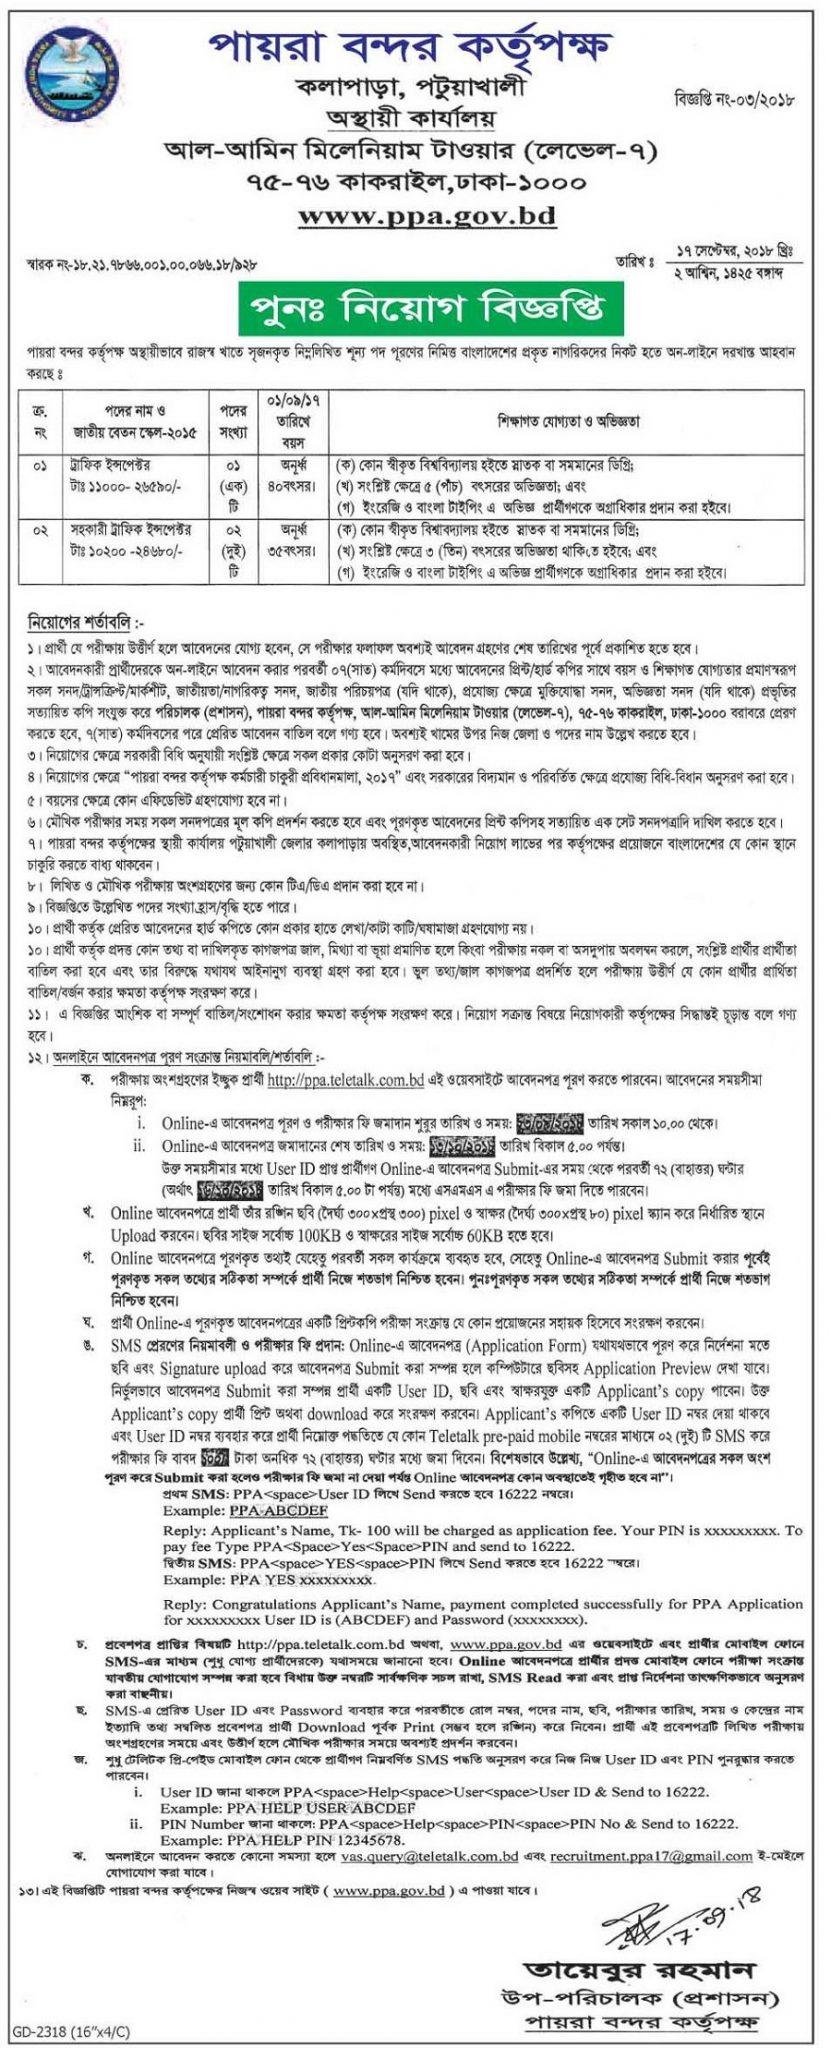 PPA teletalk Application Form & Admit Card Download